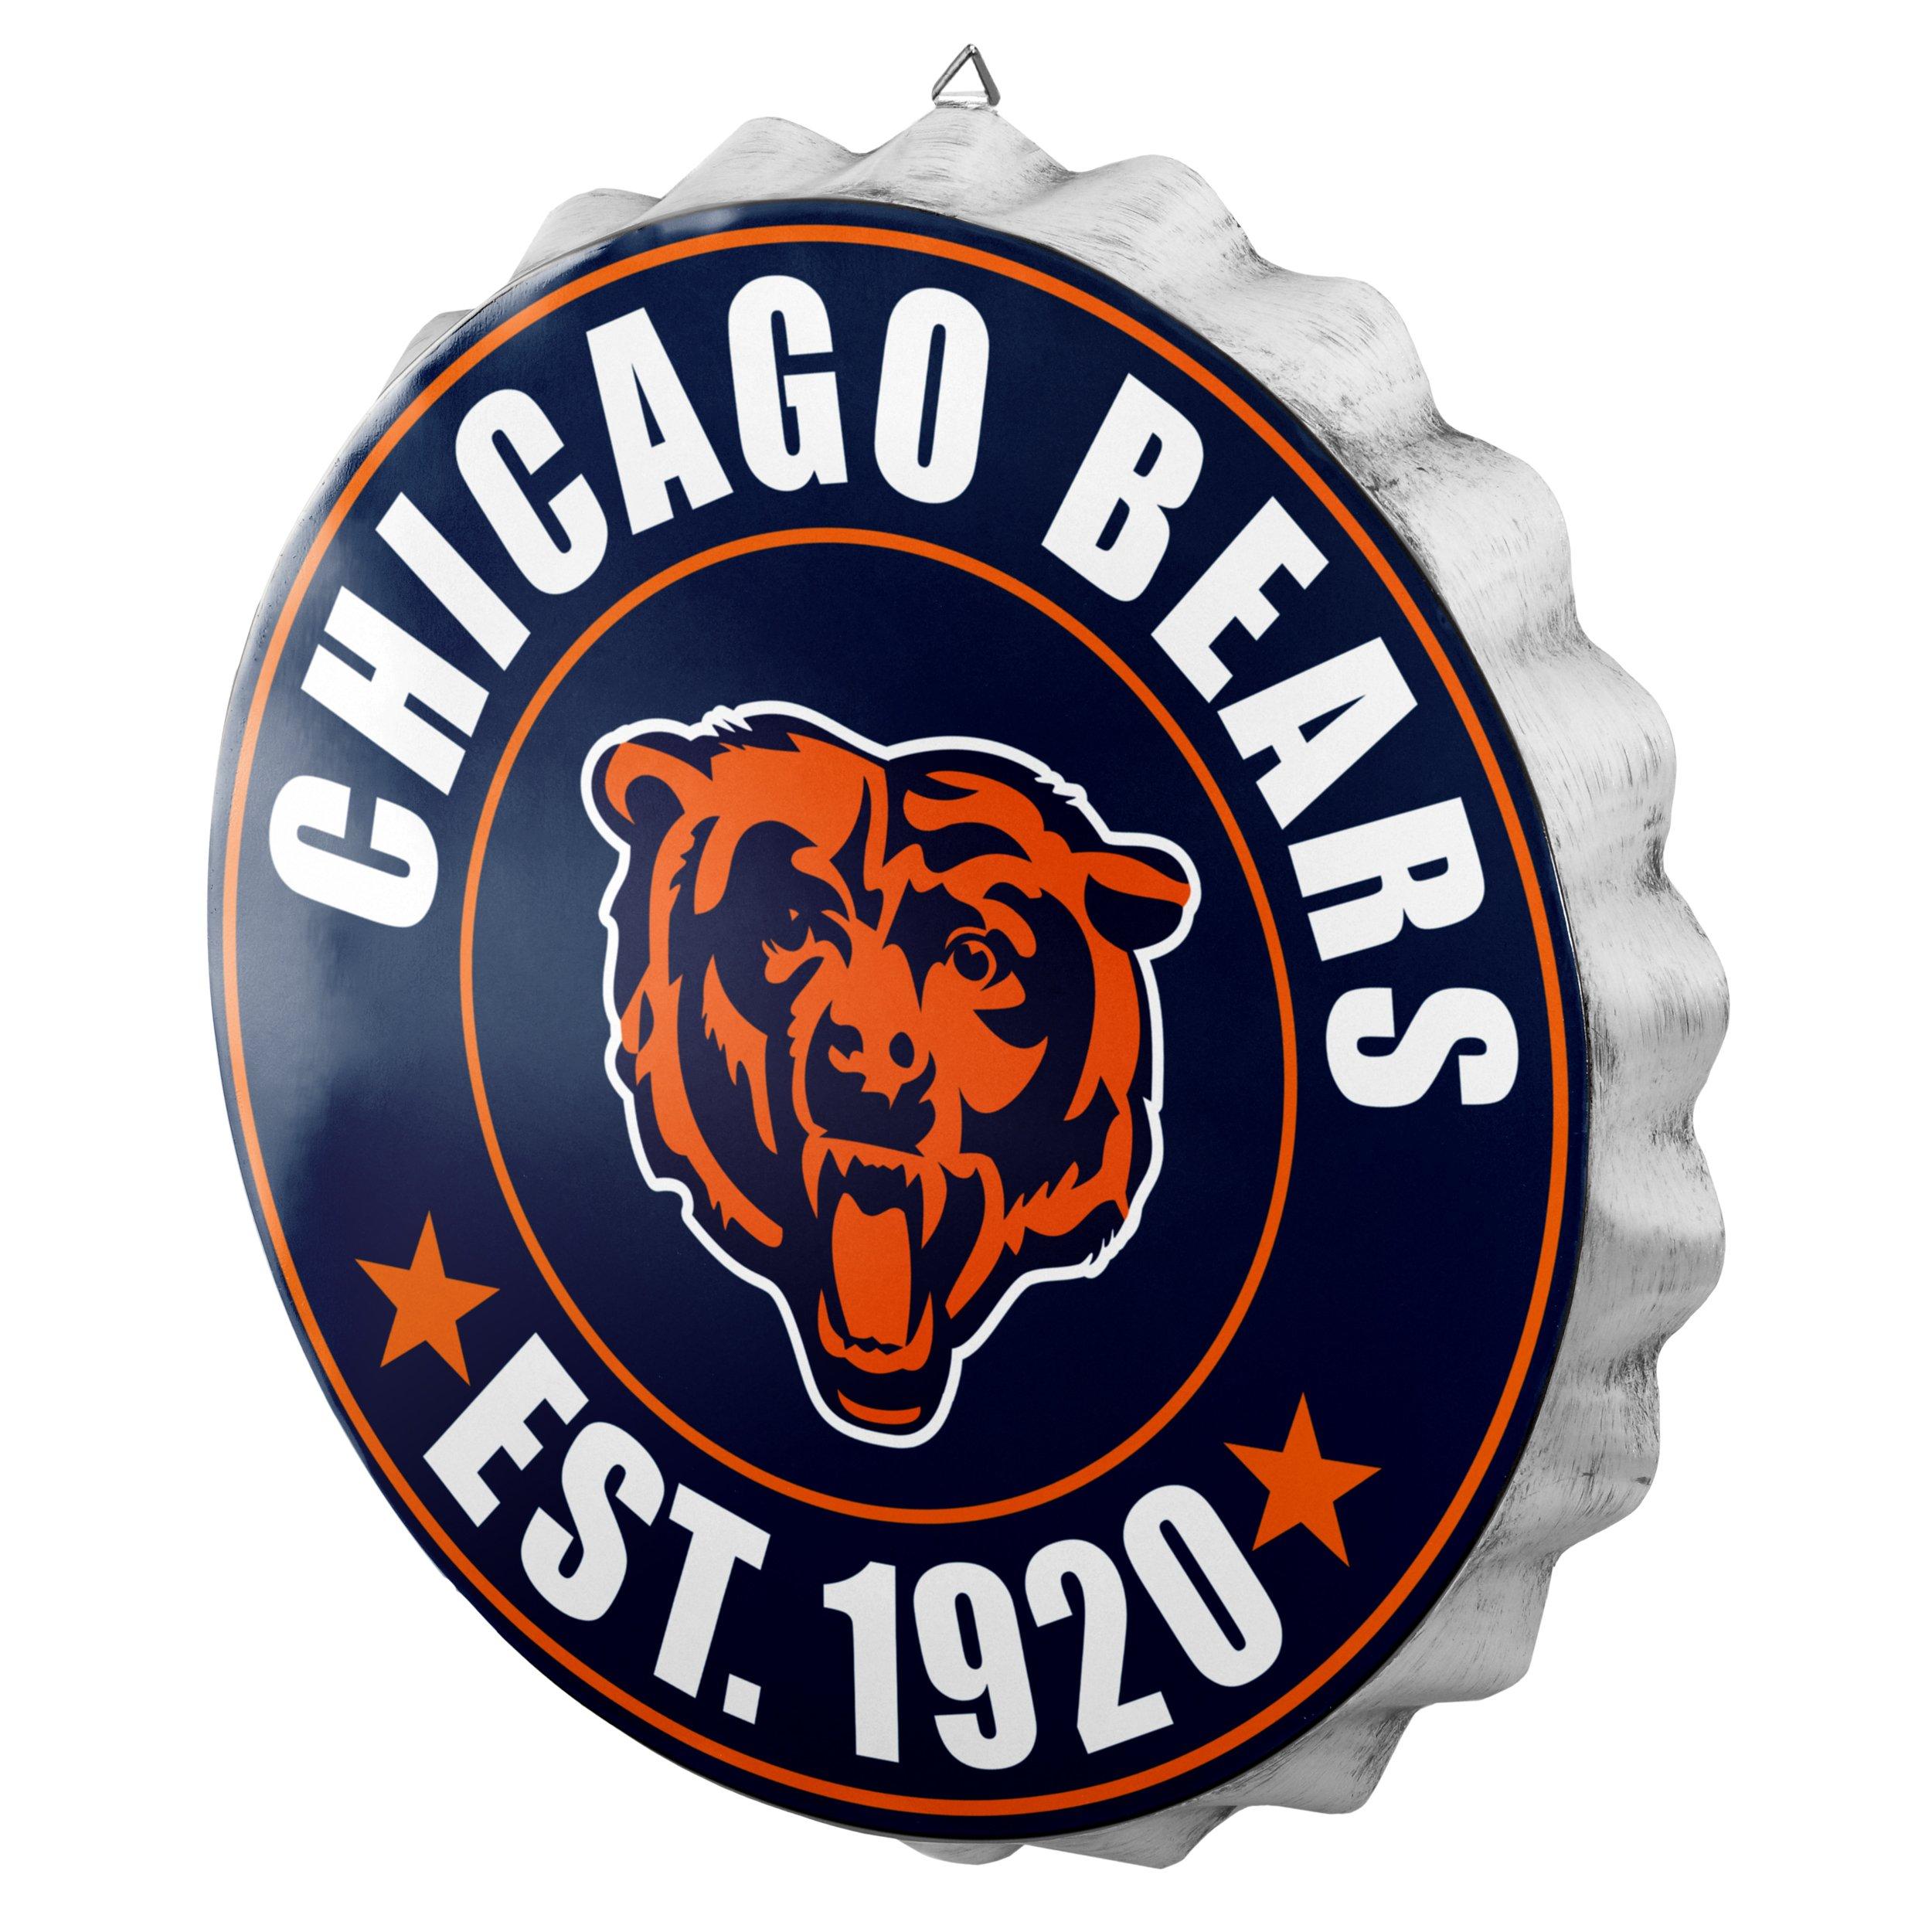 Chicago Bears NFL Bottle Cap Wall Sign